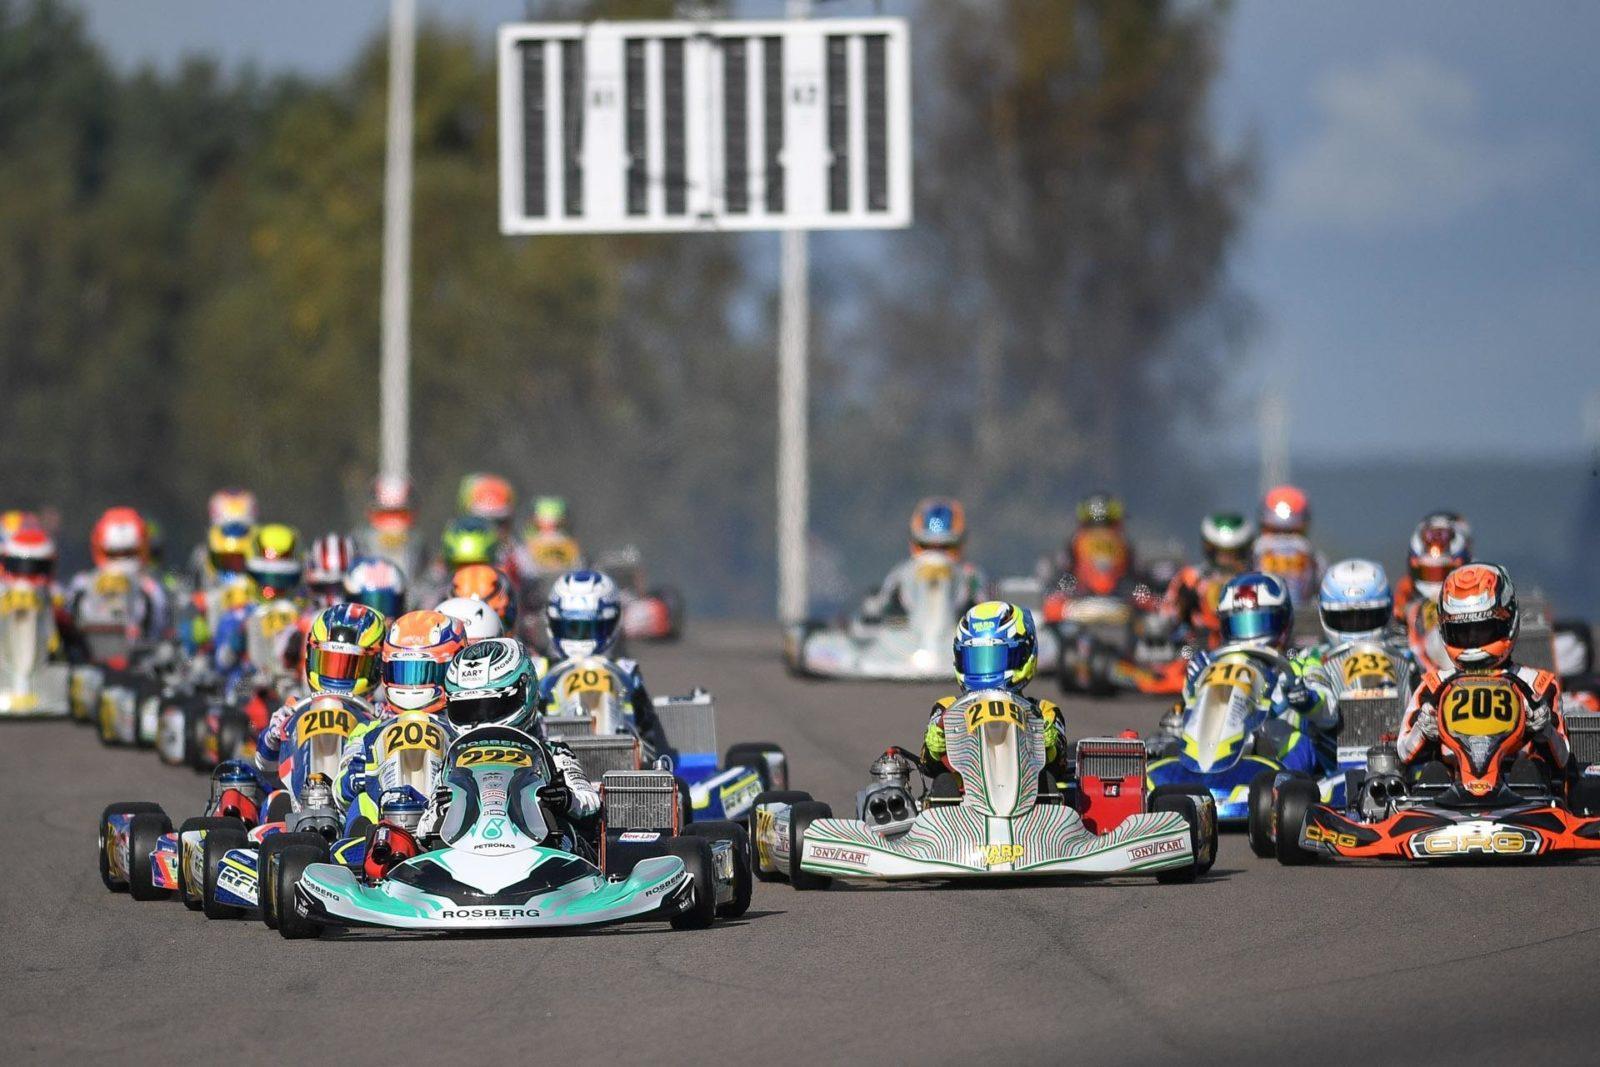 Taylor Barnard leads OK-Junior into the opening corner of a heat race at the 2018 CIK World Junior Championship